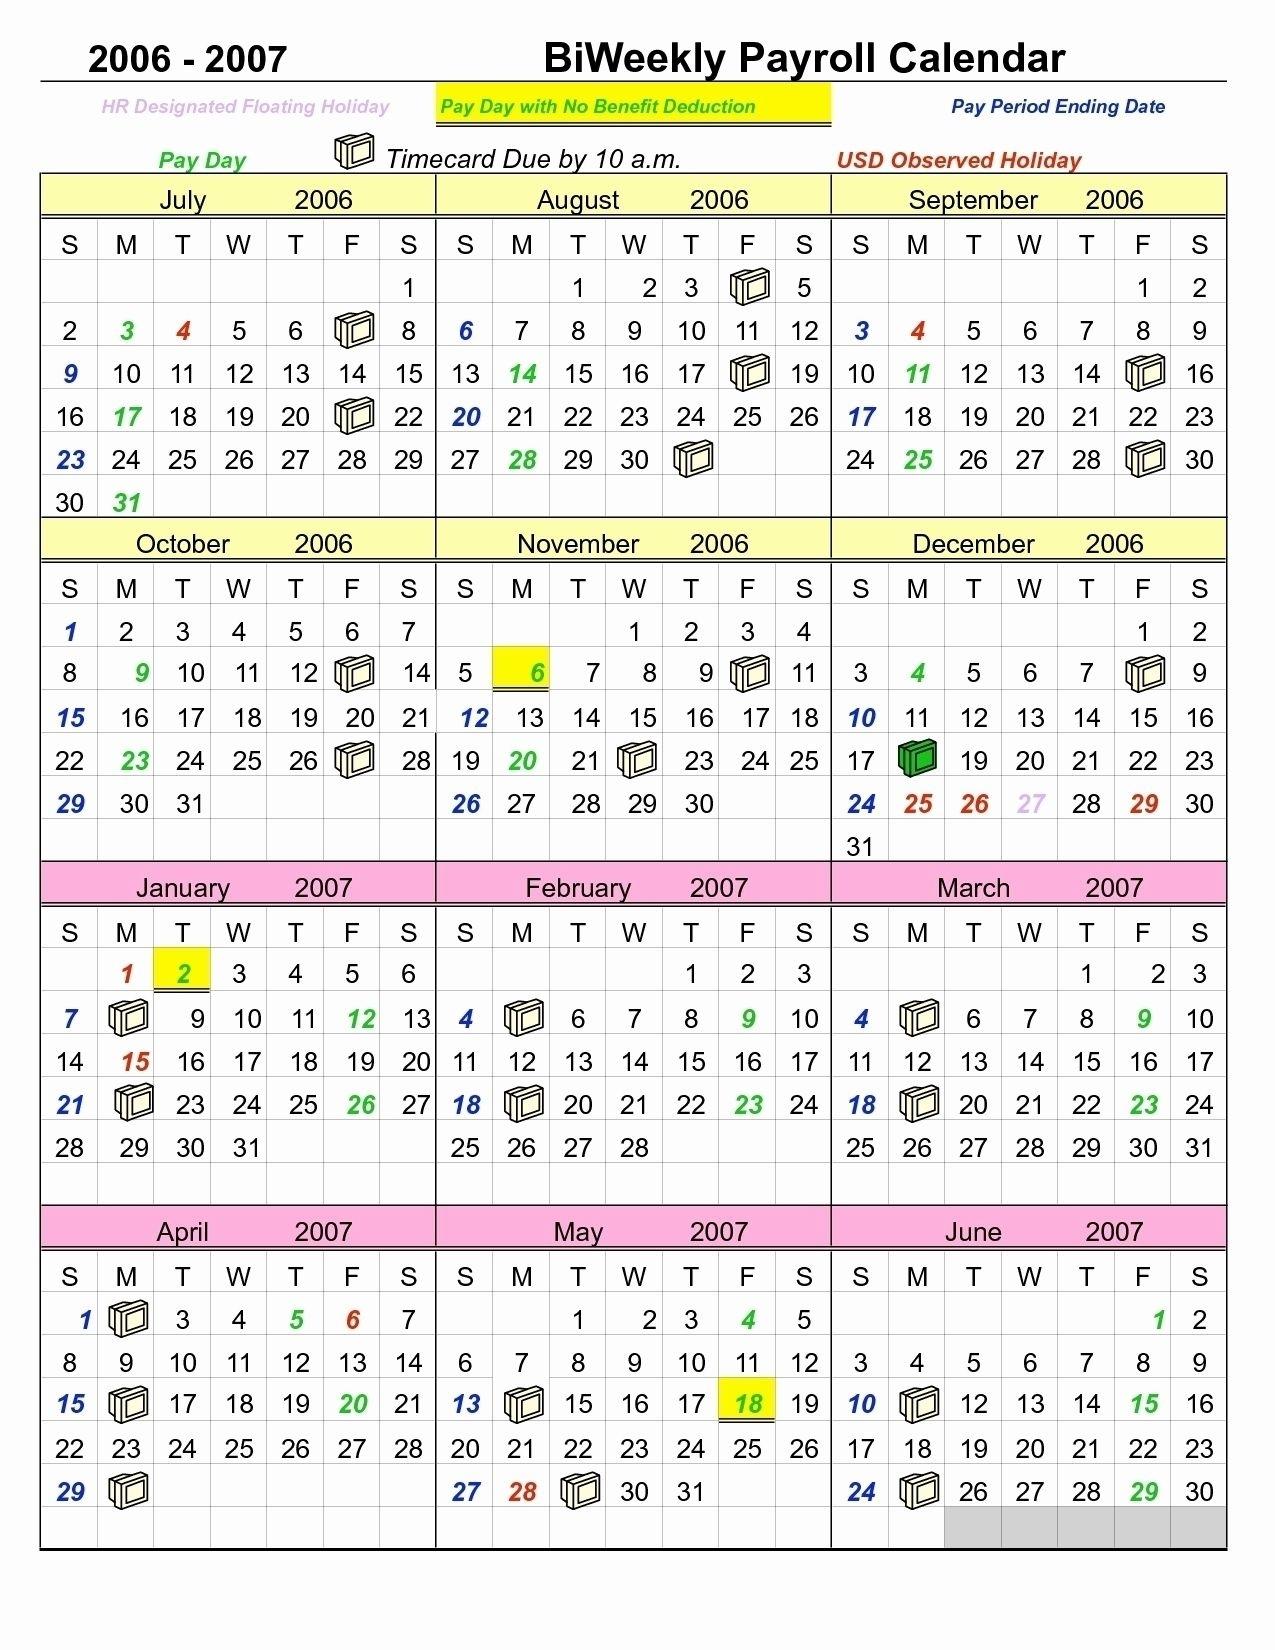 Free Printable Employee Calendar In 2020 | Payroll Calendar, Calendar Printables, Calendar Template